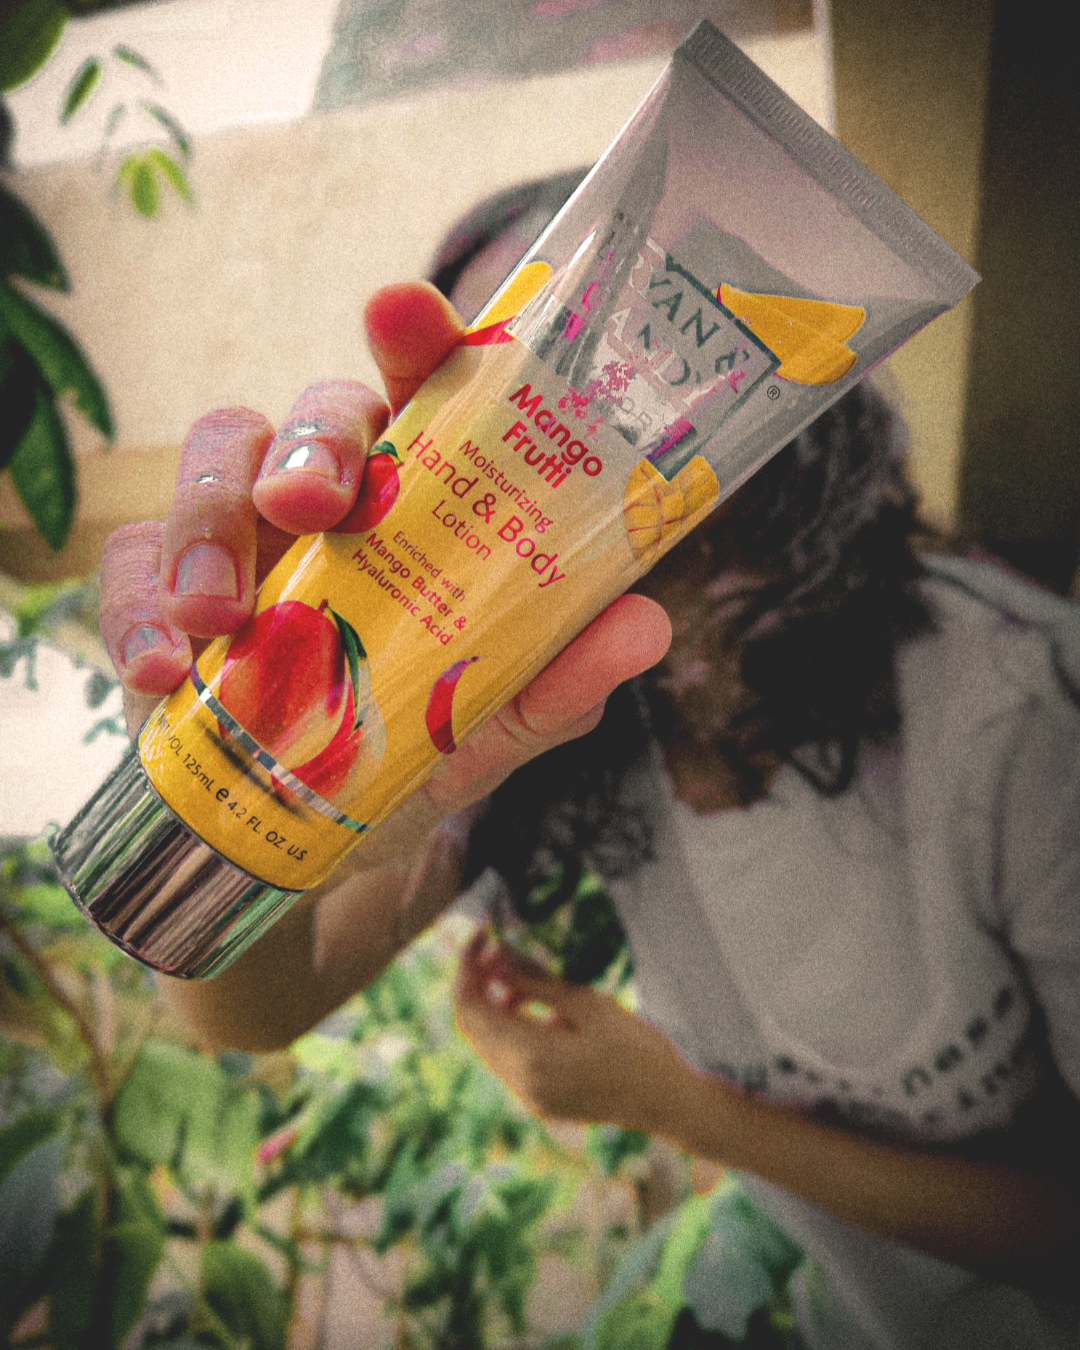 Bryan & Candy New York Mango Frutti Hand and Body Lotion-Moisturizing with great aroma-By shreya_mehta